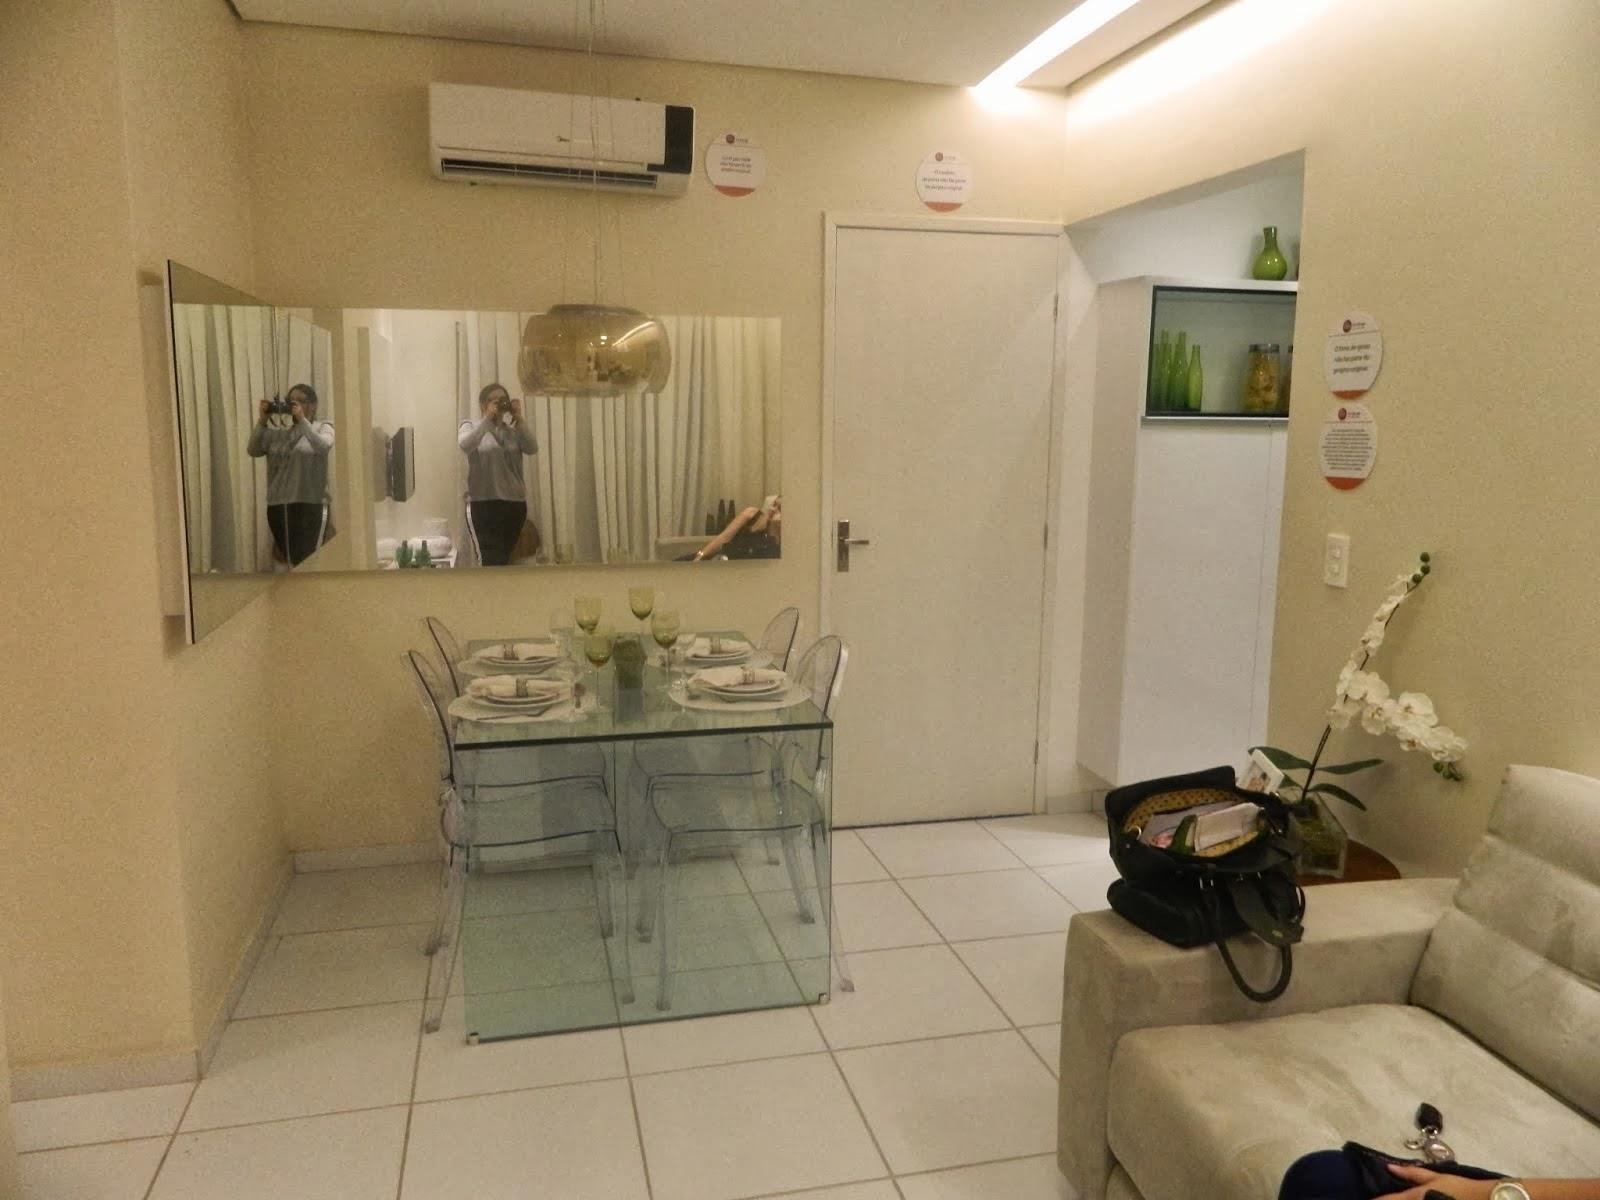 Sala De Jantar Pequena E Moderna Sala De Jantar Pequena Cinza  -> Decoracao De Sala De Jantar Pequena Simples E Barata